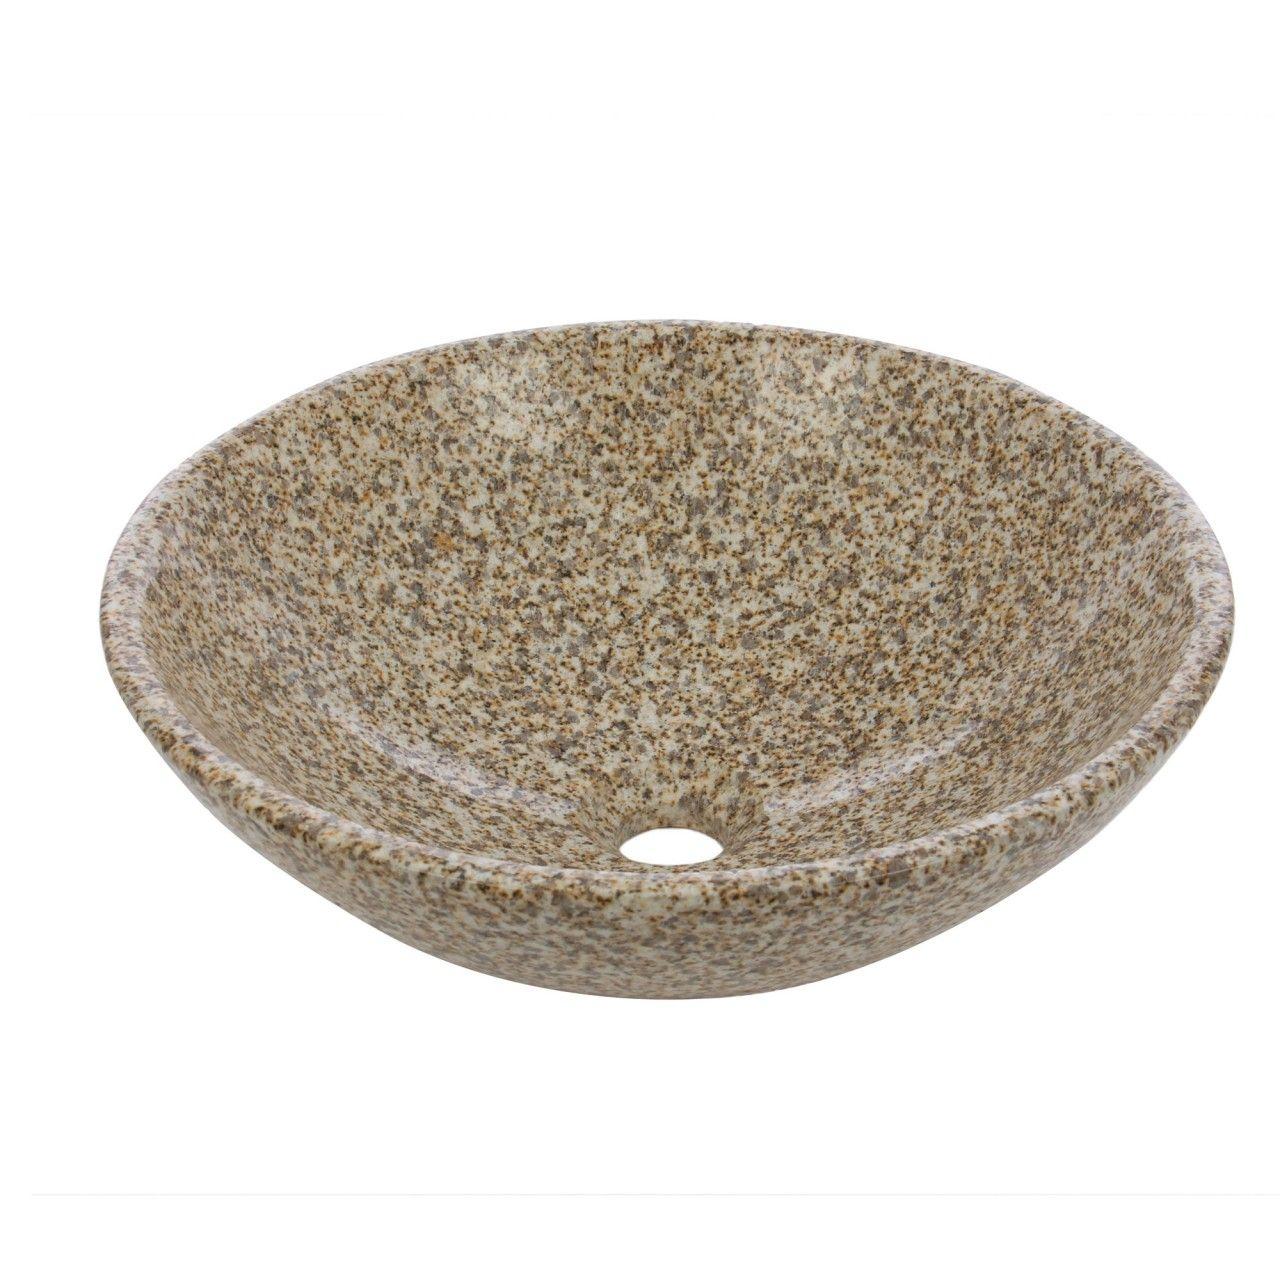 Dedeman Lavoar Marmura Rotund Pe Blat Yf058 Galben Granit Dedicat Planurilor Tale Home Decor Decorative Bowls Decor